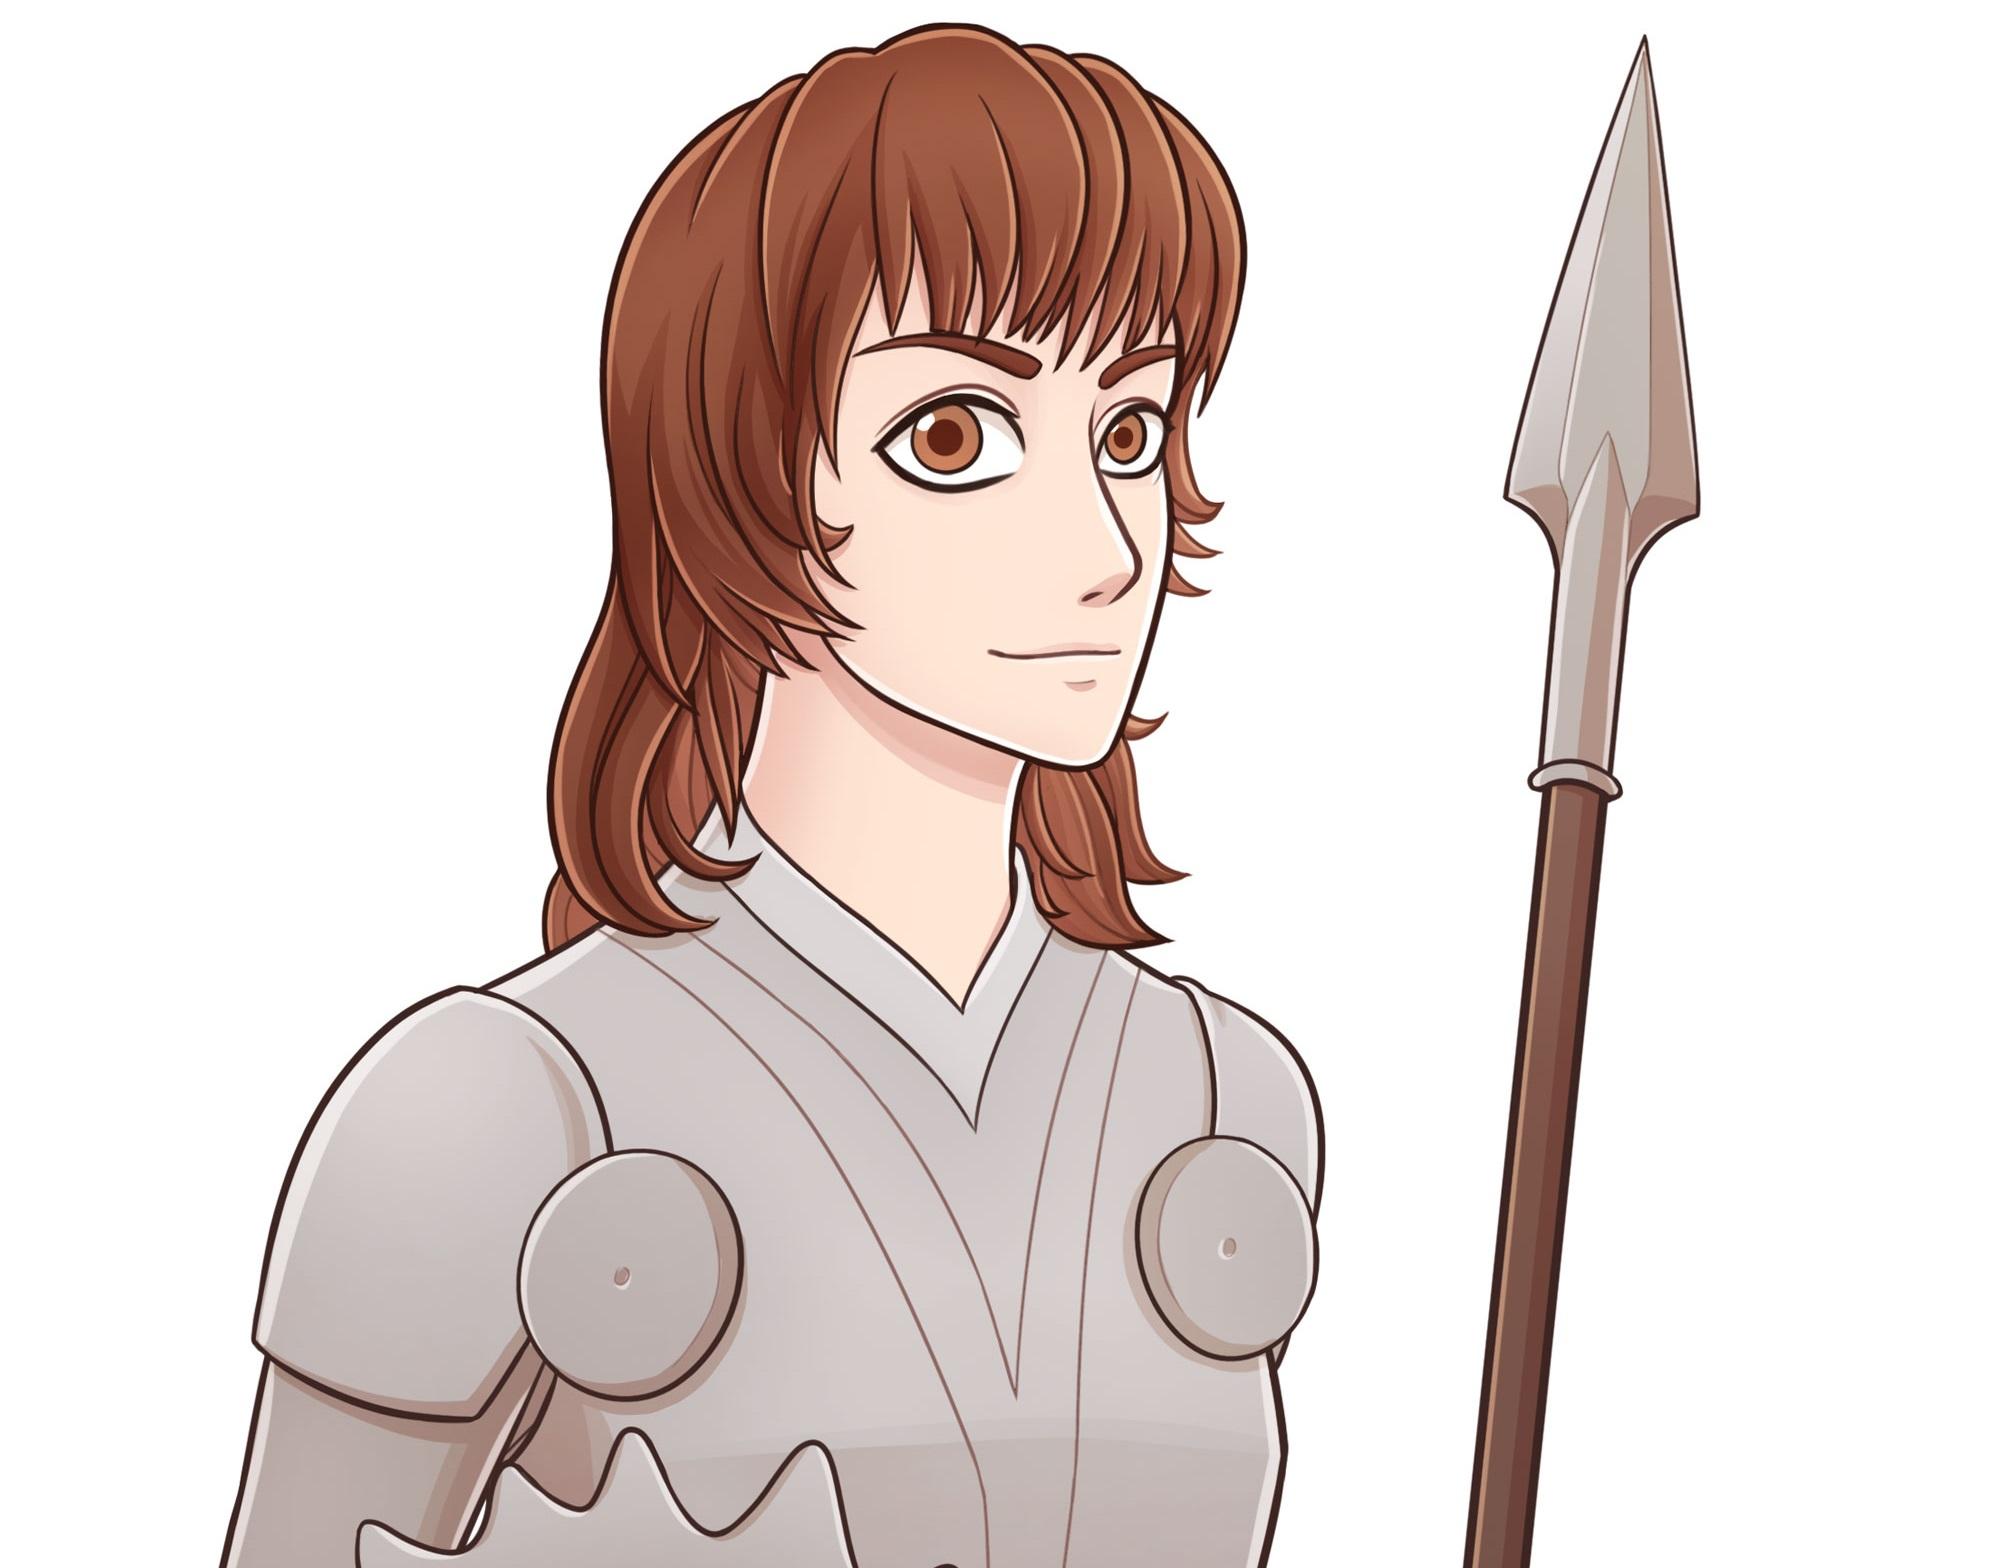 Personnage : Alaïs Brianna Starstorm